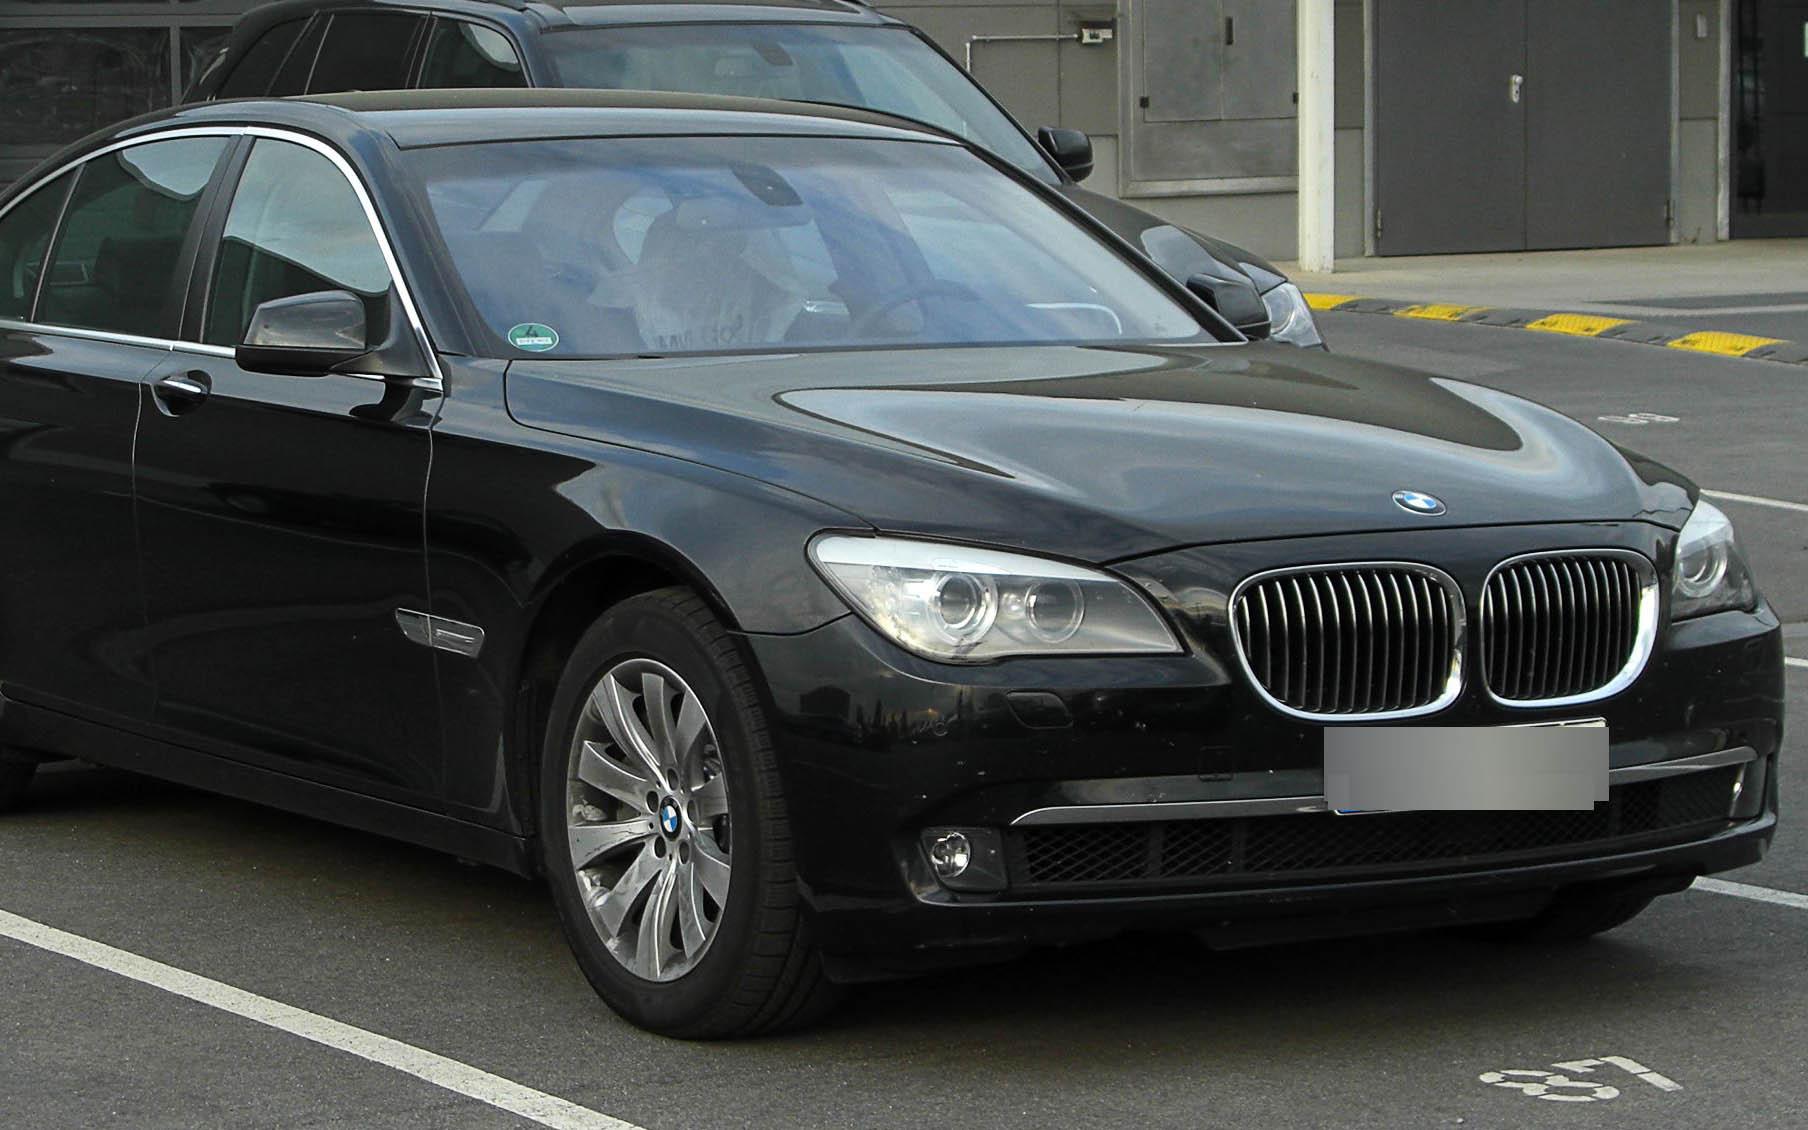 BMW 760I – 2012 GUARD Бронированный B6/B7